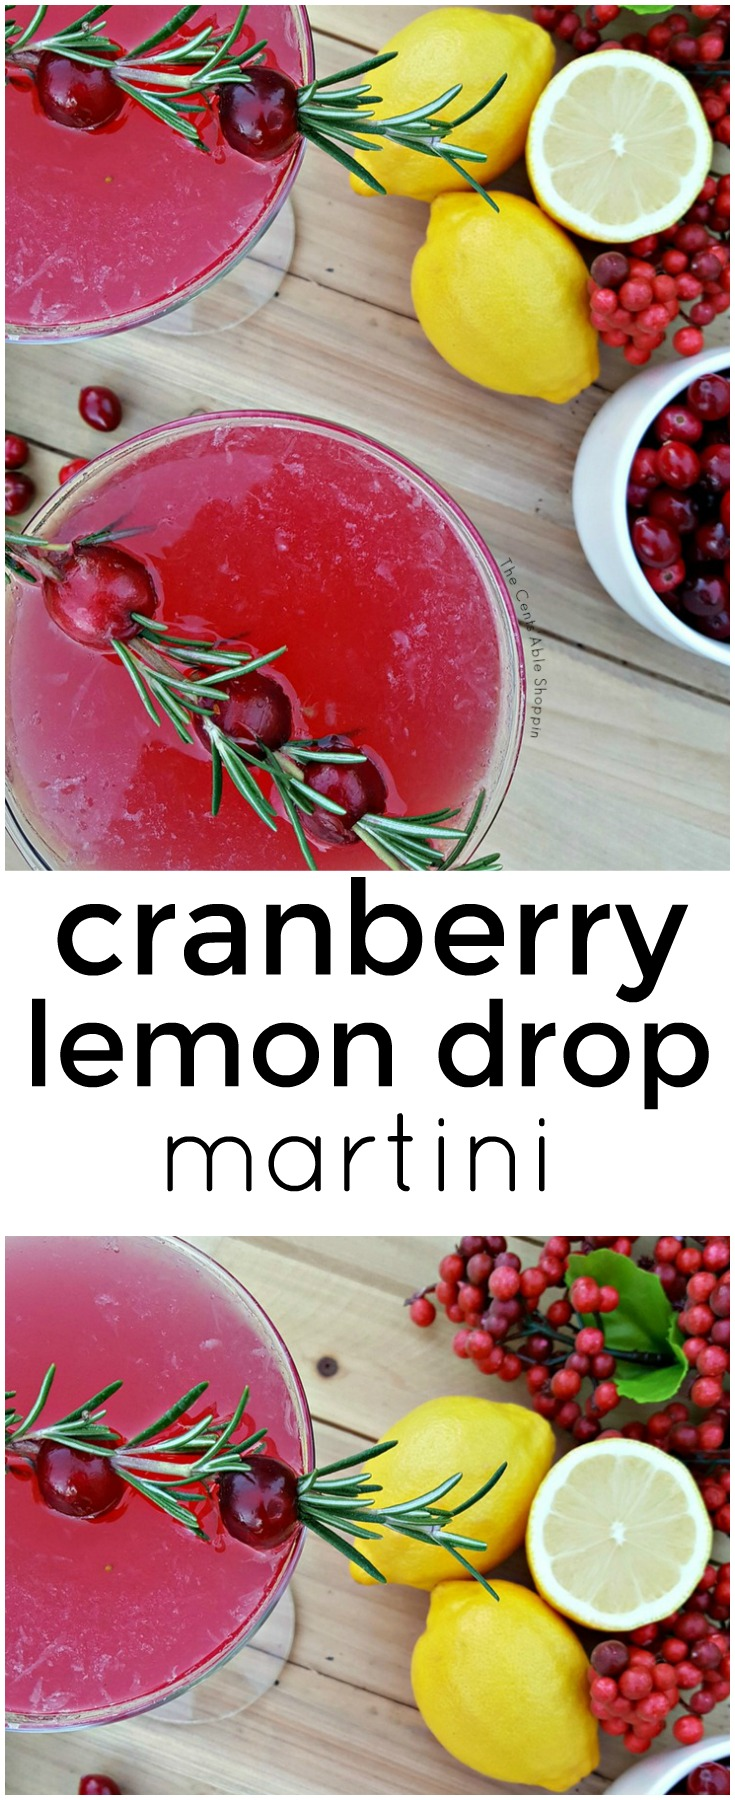 Cranberry Lemon Drop Martini